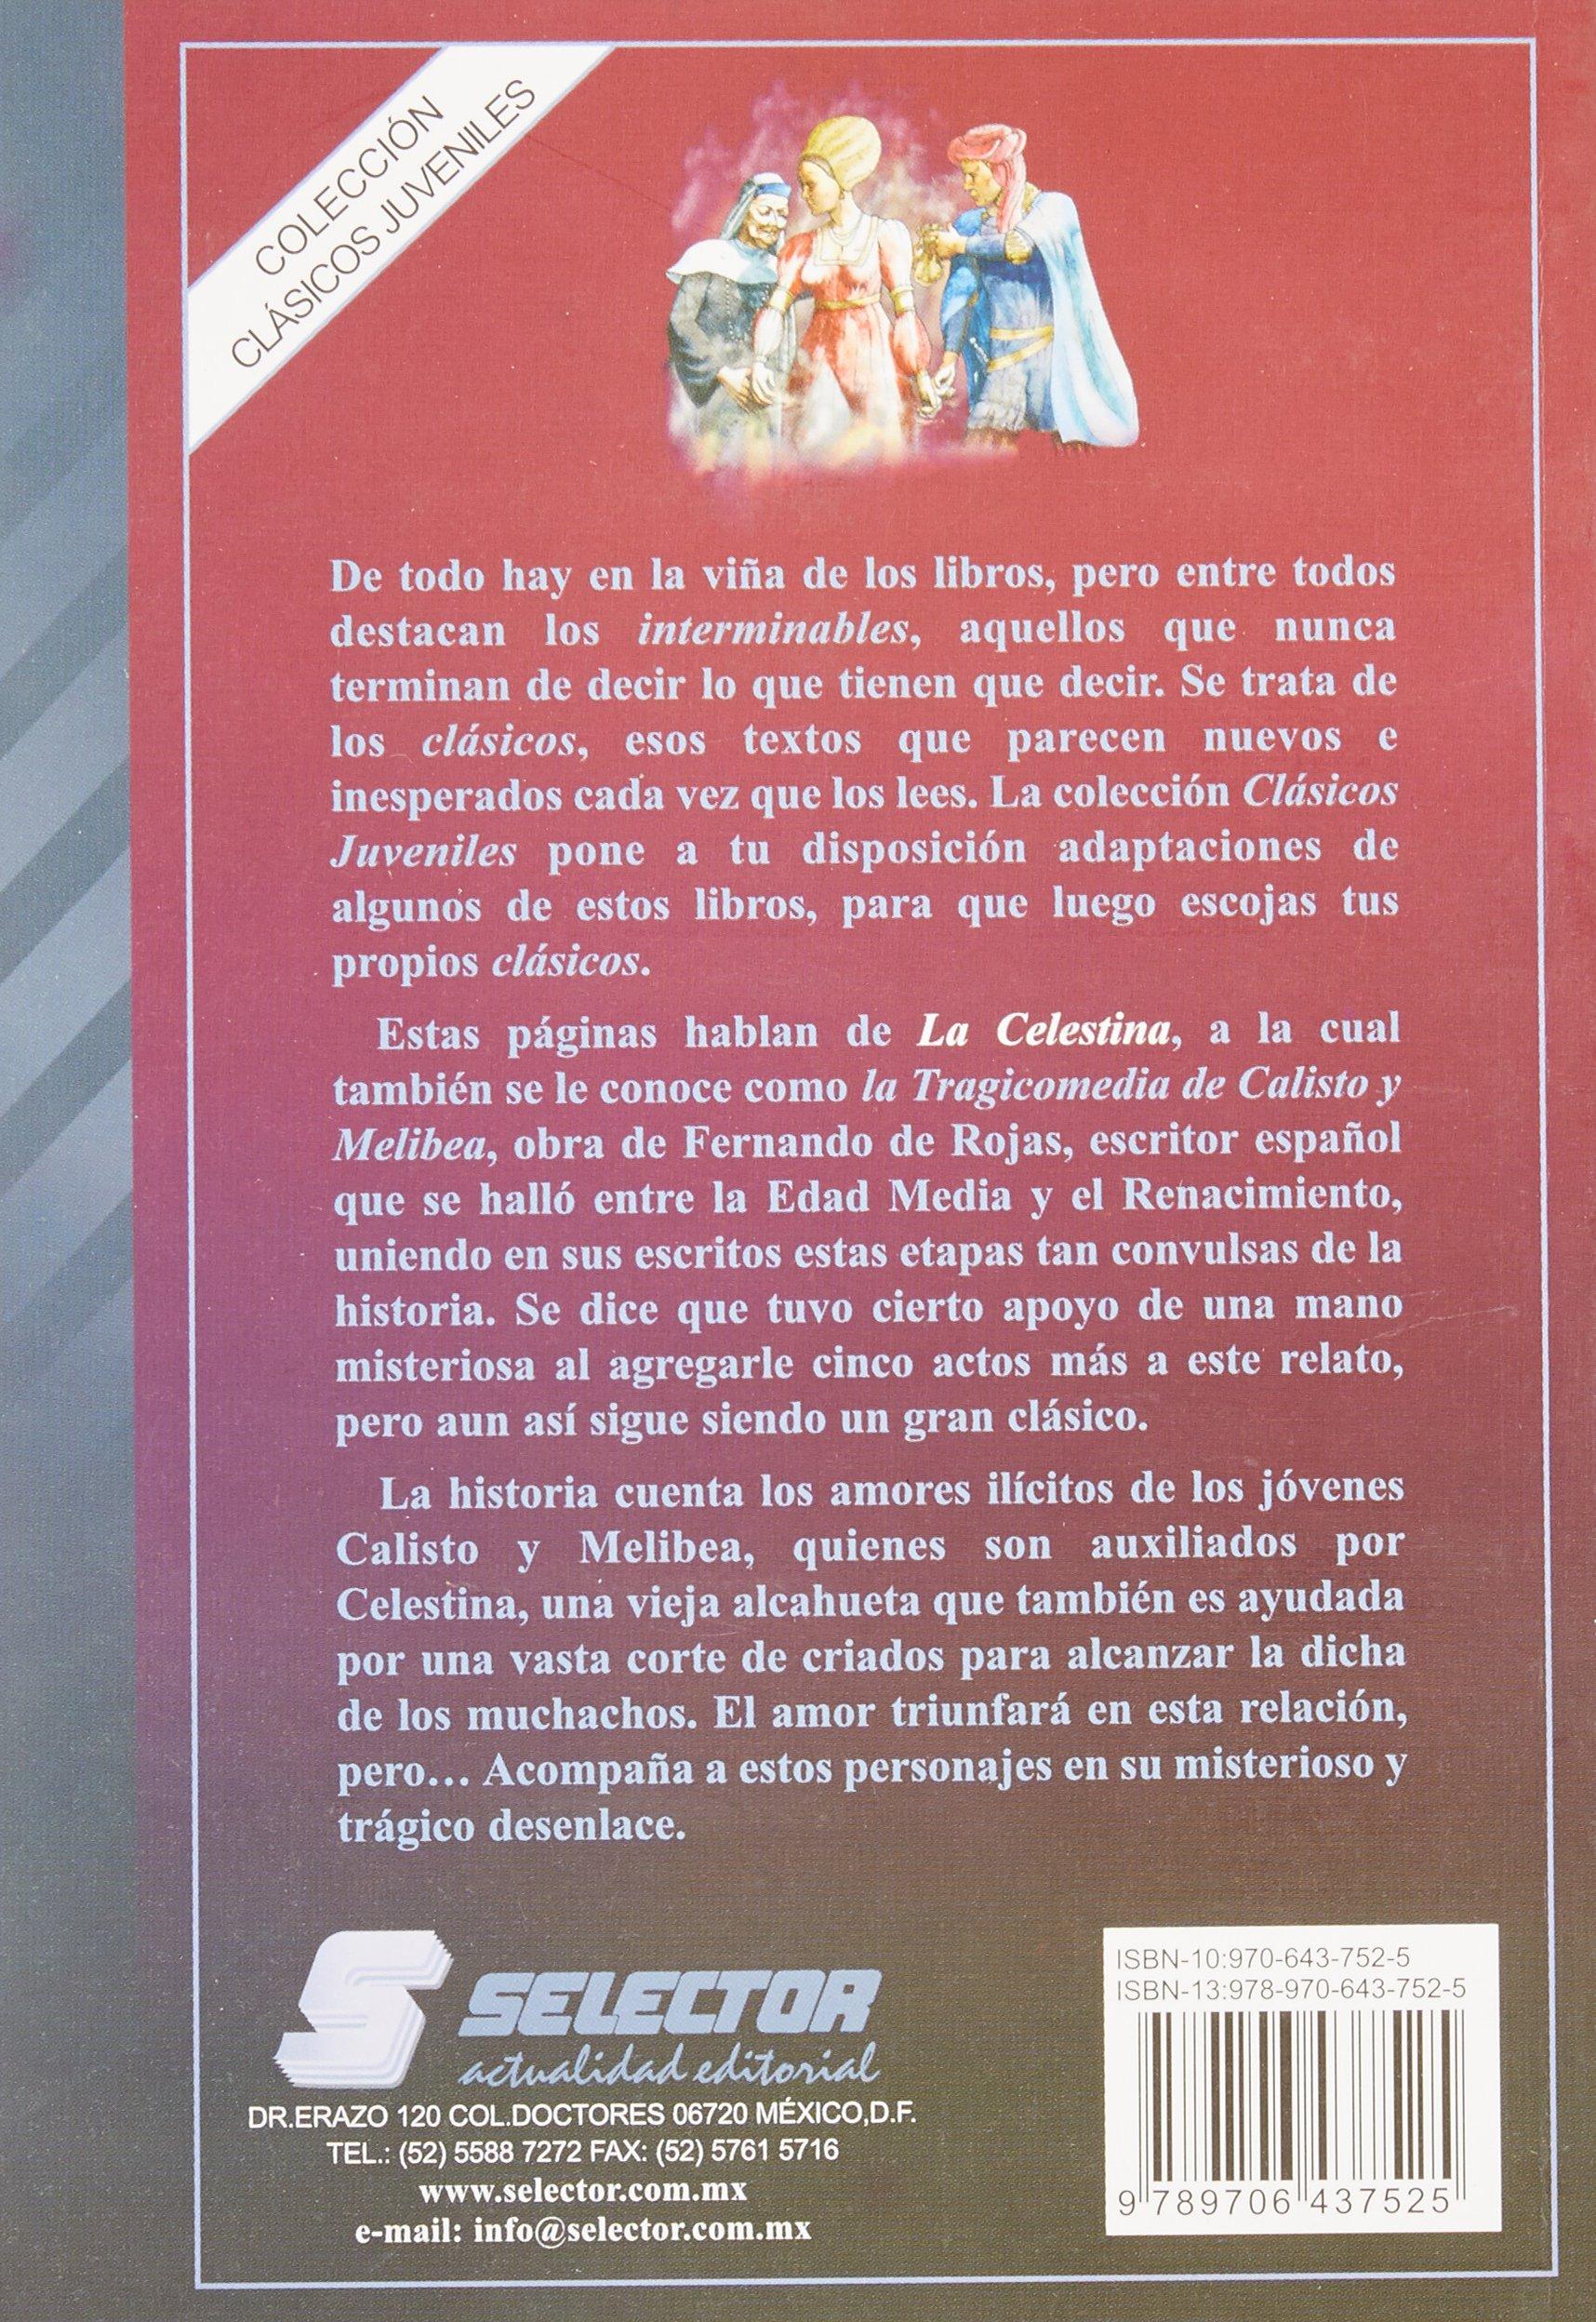 La celestina / Celestine (Clasicos juveniles) (Spanish Edition): Fernando De Rojas: 9789706437525: Amazon.com: Books